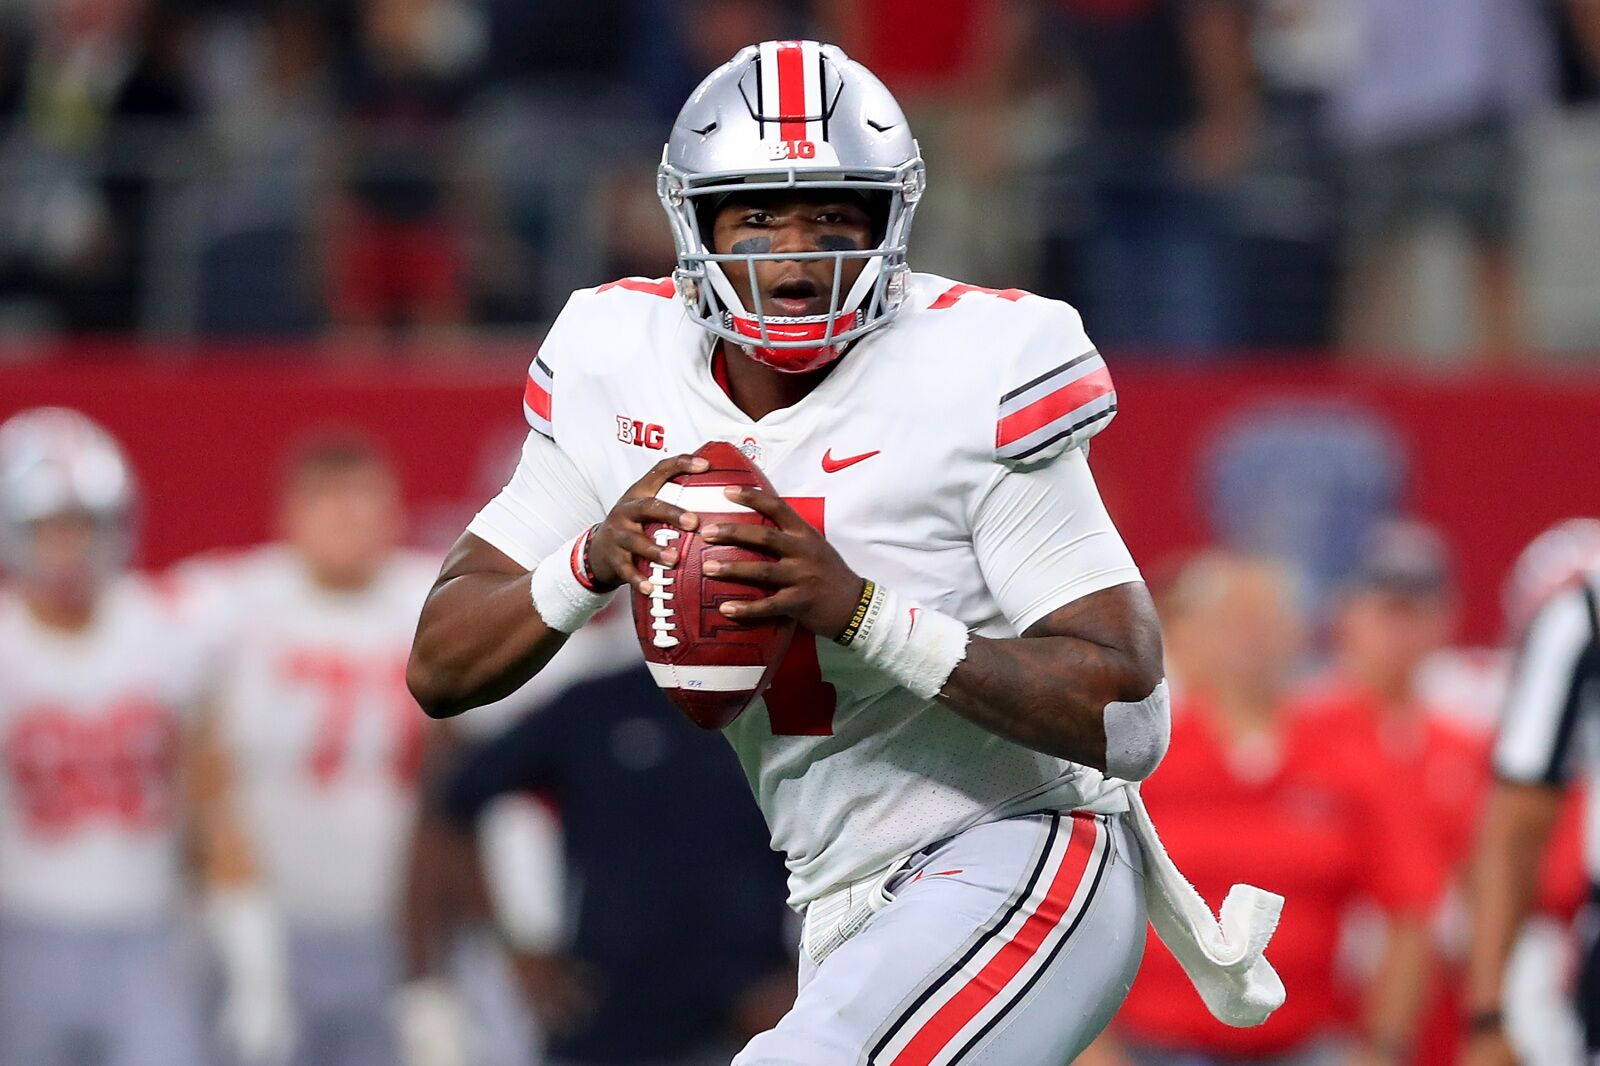 Ohio State Football: Dwayne Haskins not a u2018Locku2019 to be 2nd QB drafted